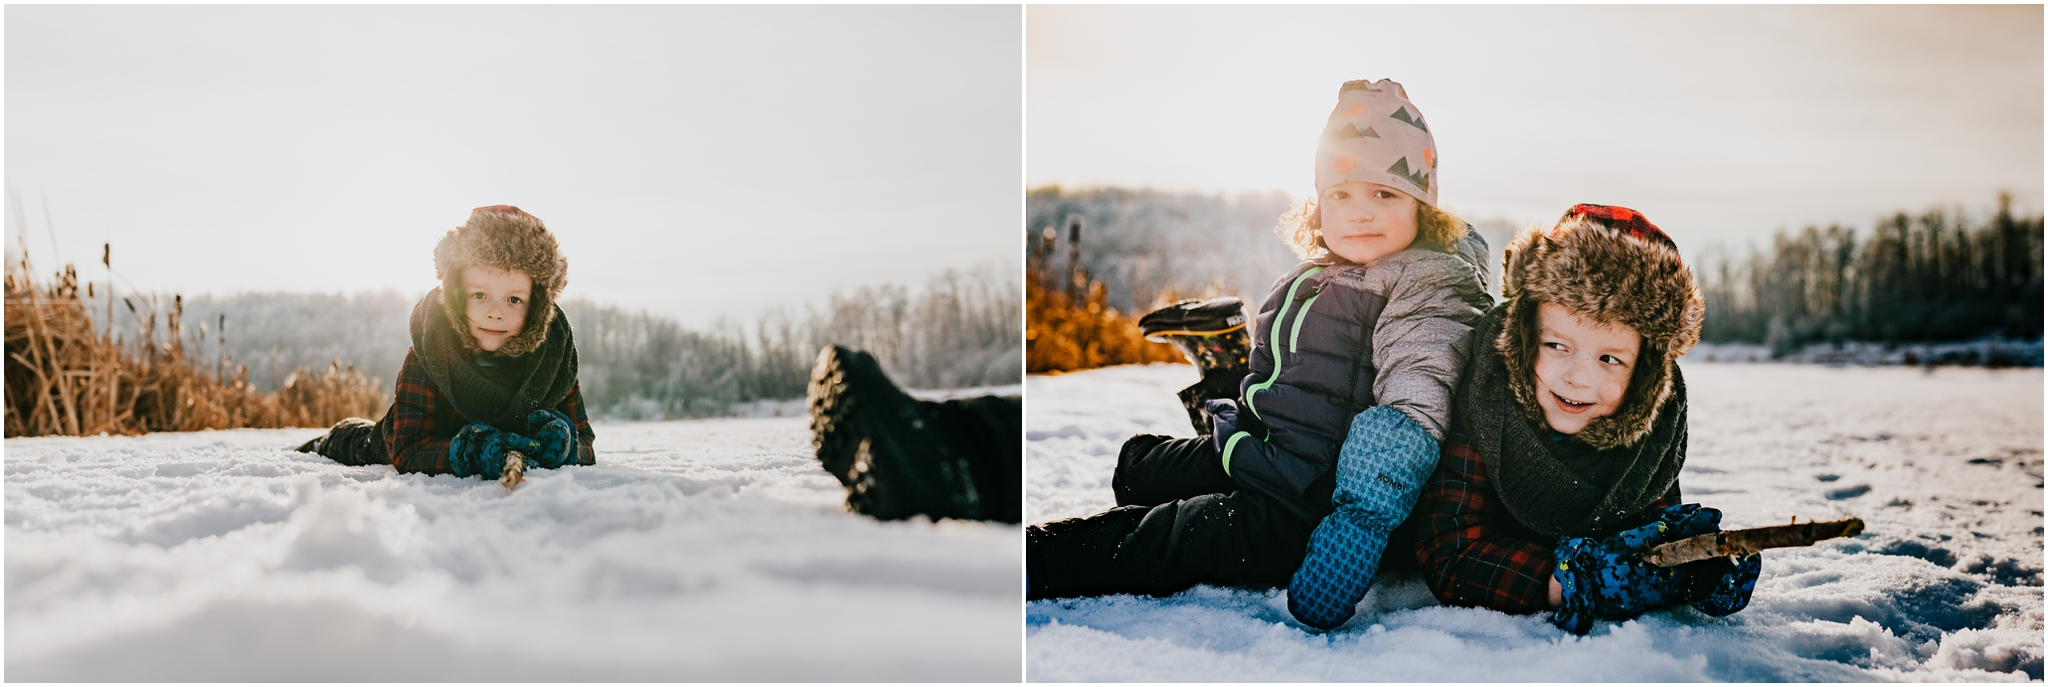 Edmonton Alberta family photographer - Winter photography Alberta Lake.jpg